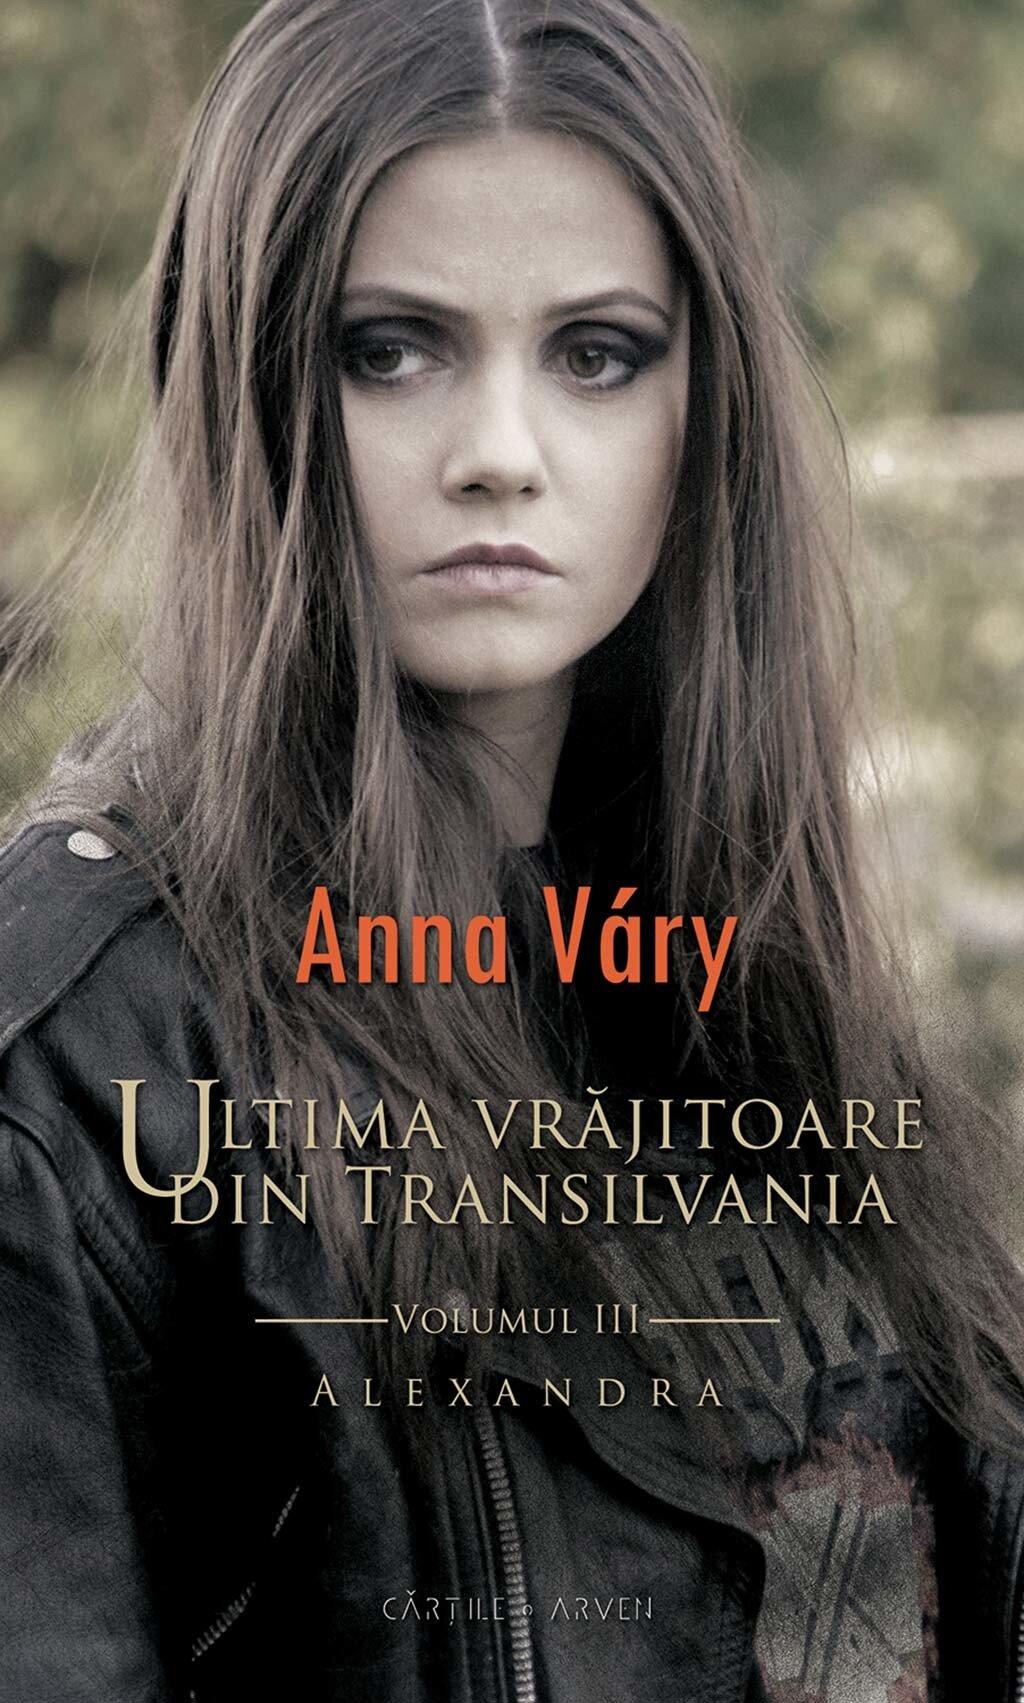 Ultima vrajitoare din Transilvania. Vol. 3 - Alexandra PDF (Download eBook)